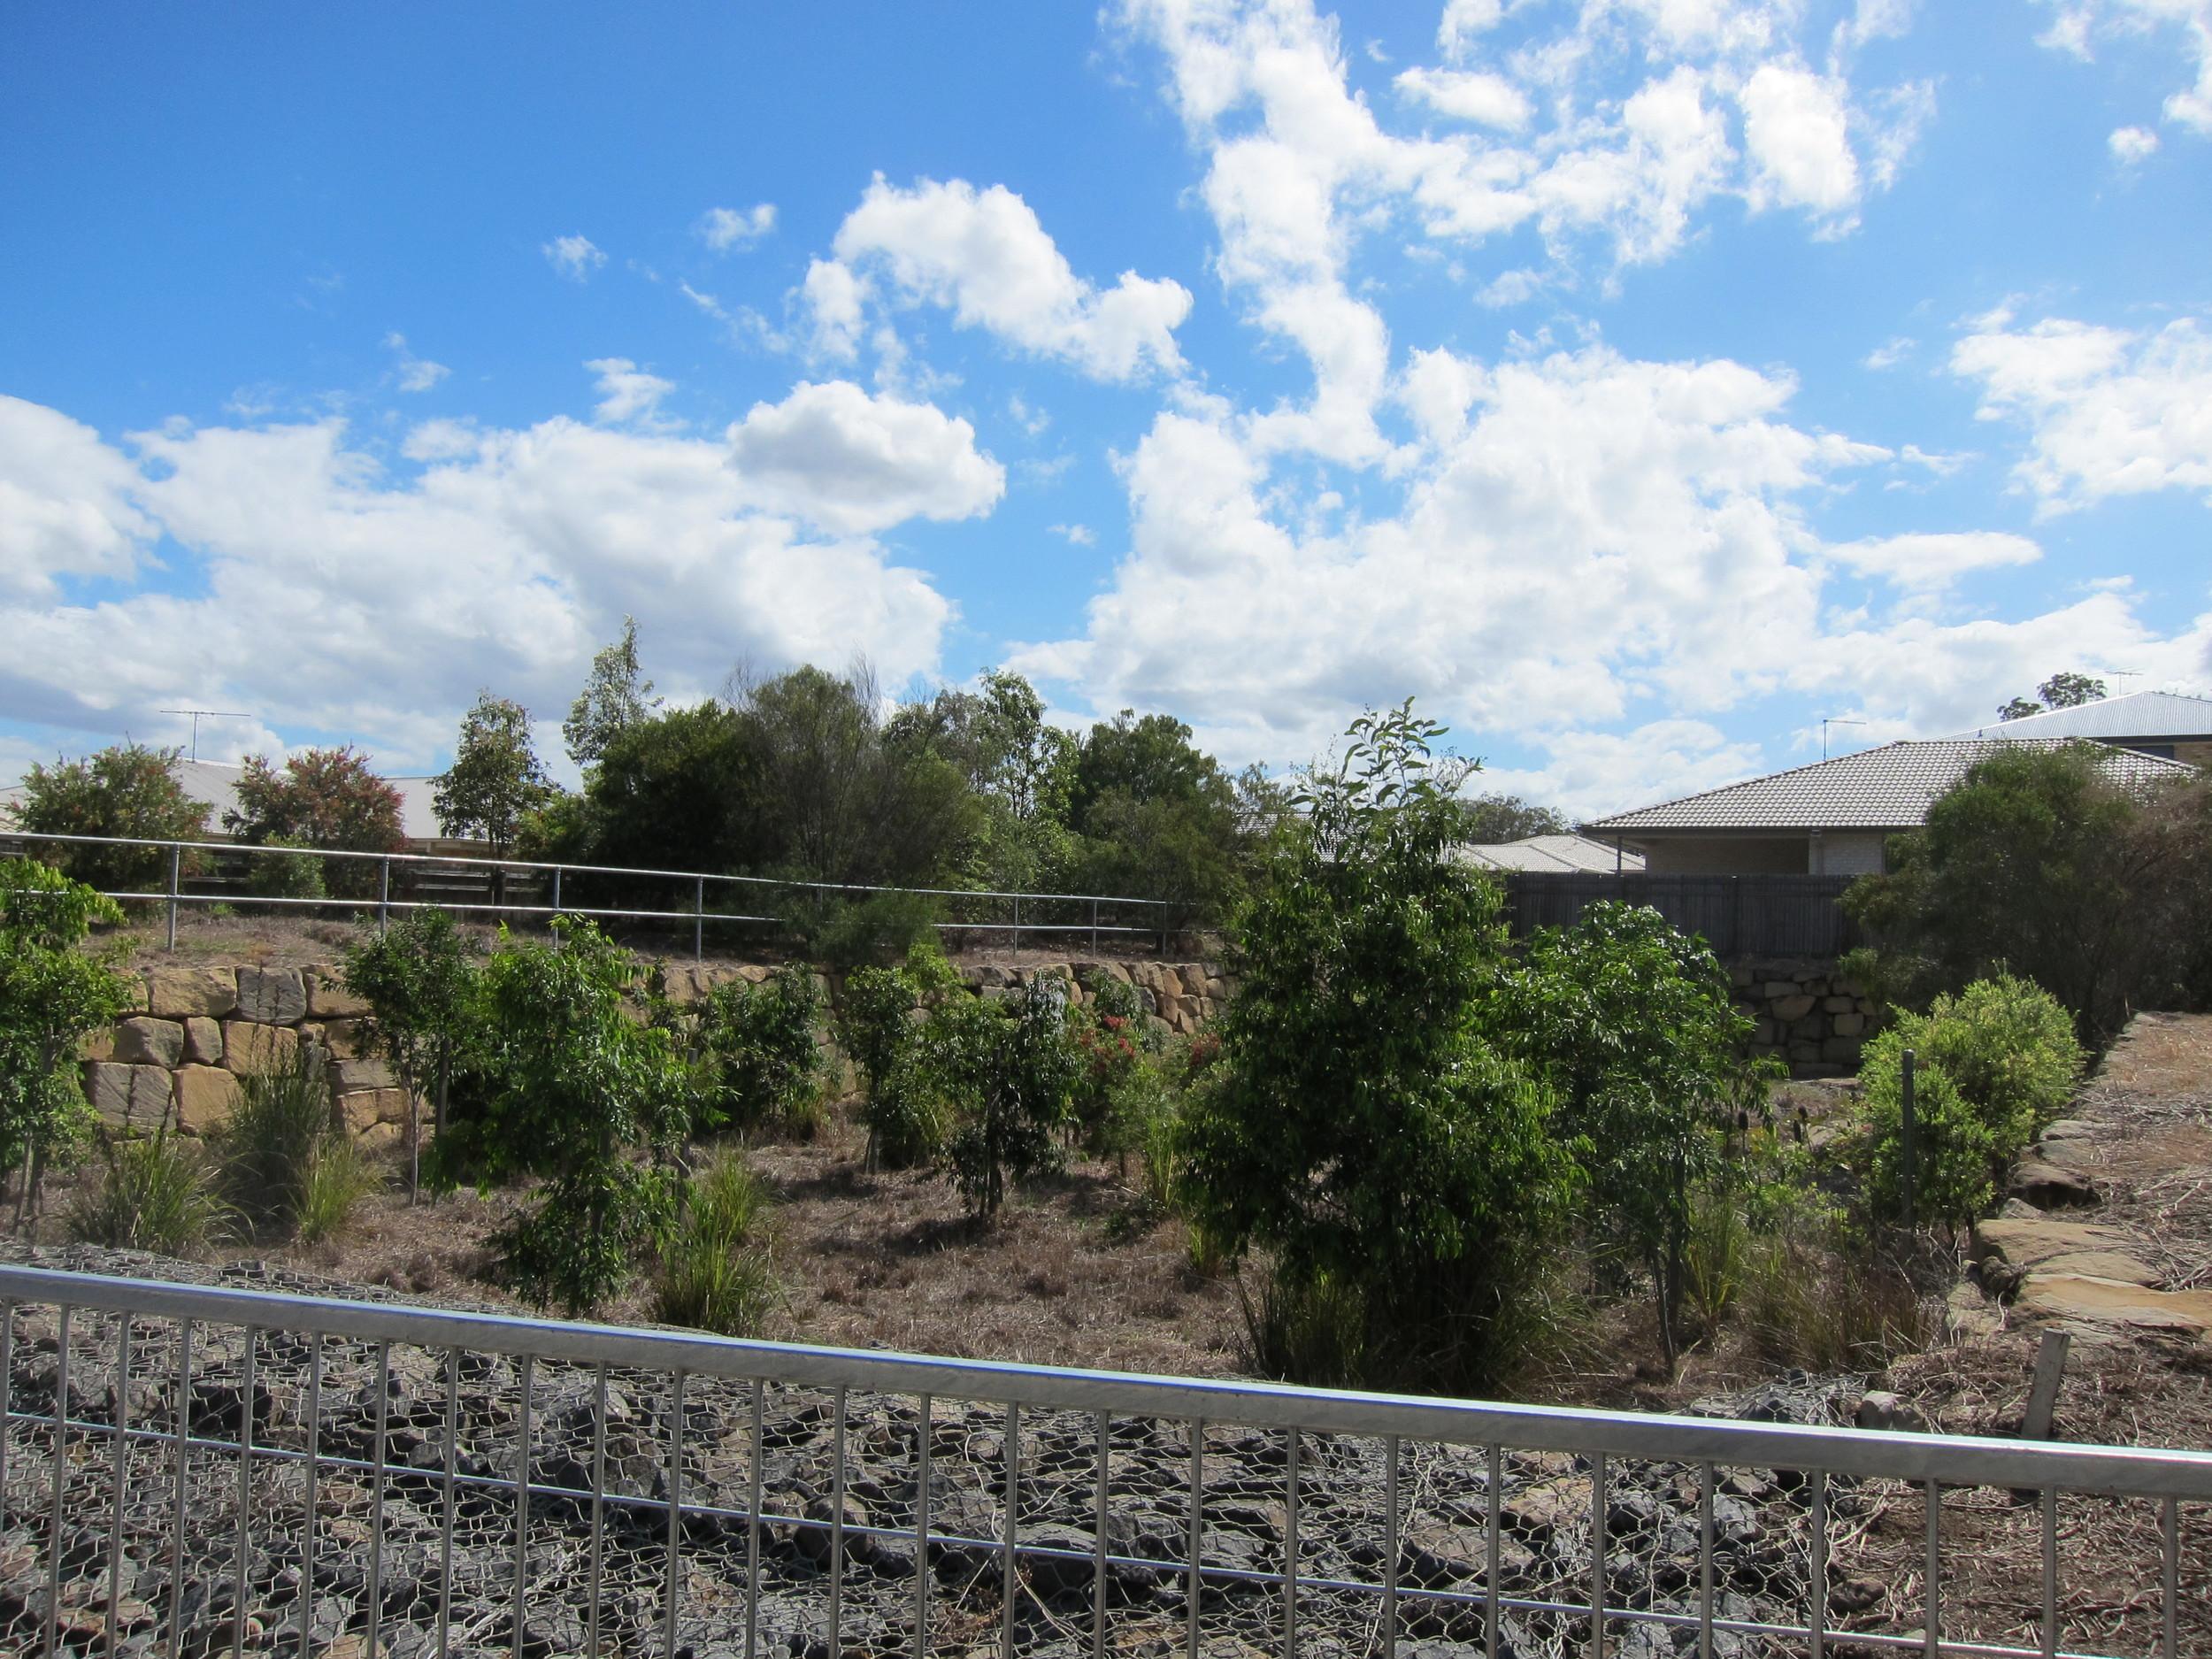 Demeio Road Bioretention System